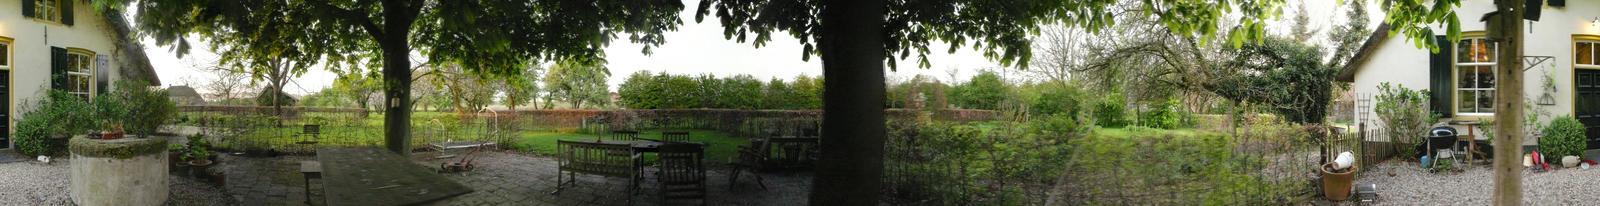 first Panorama by dutchfreak25